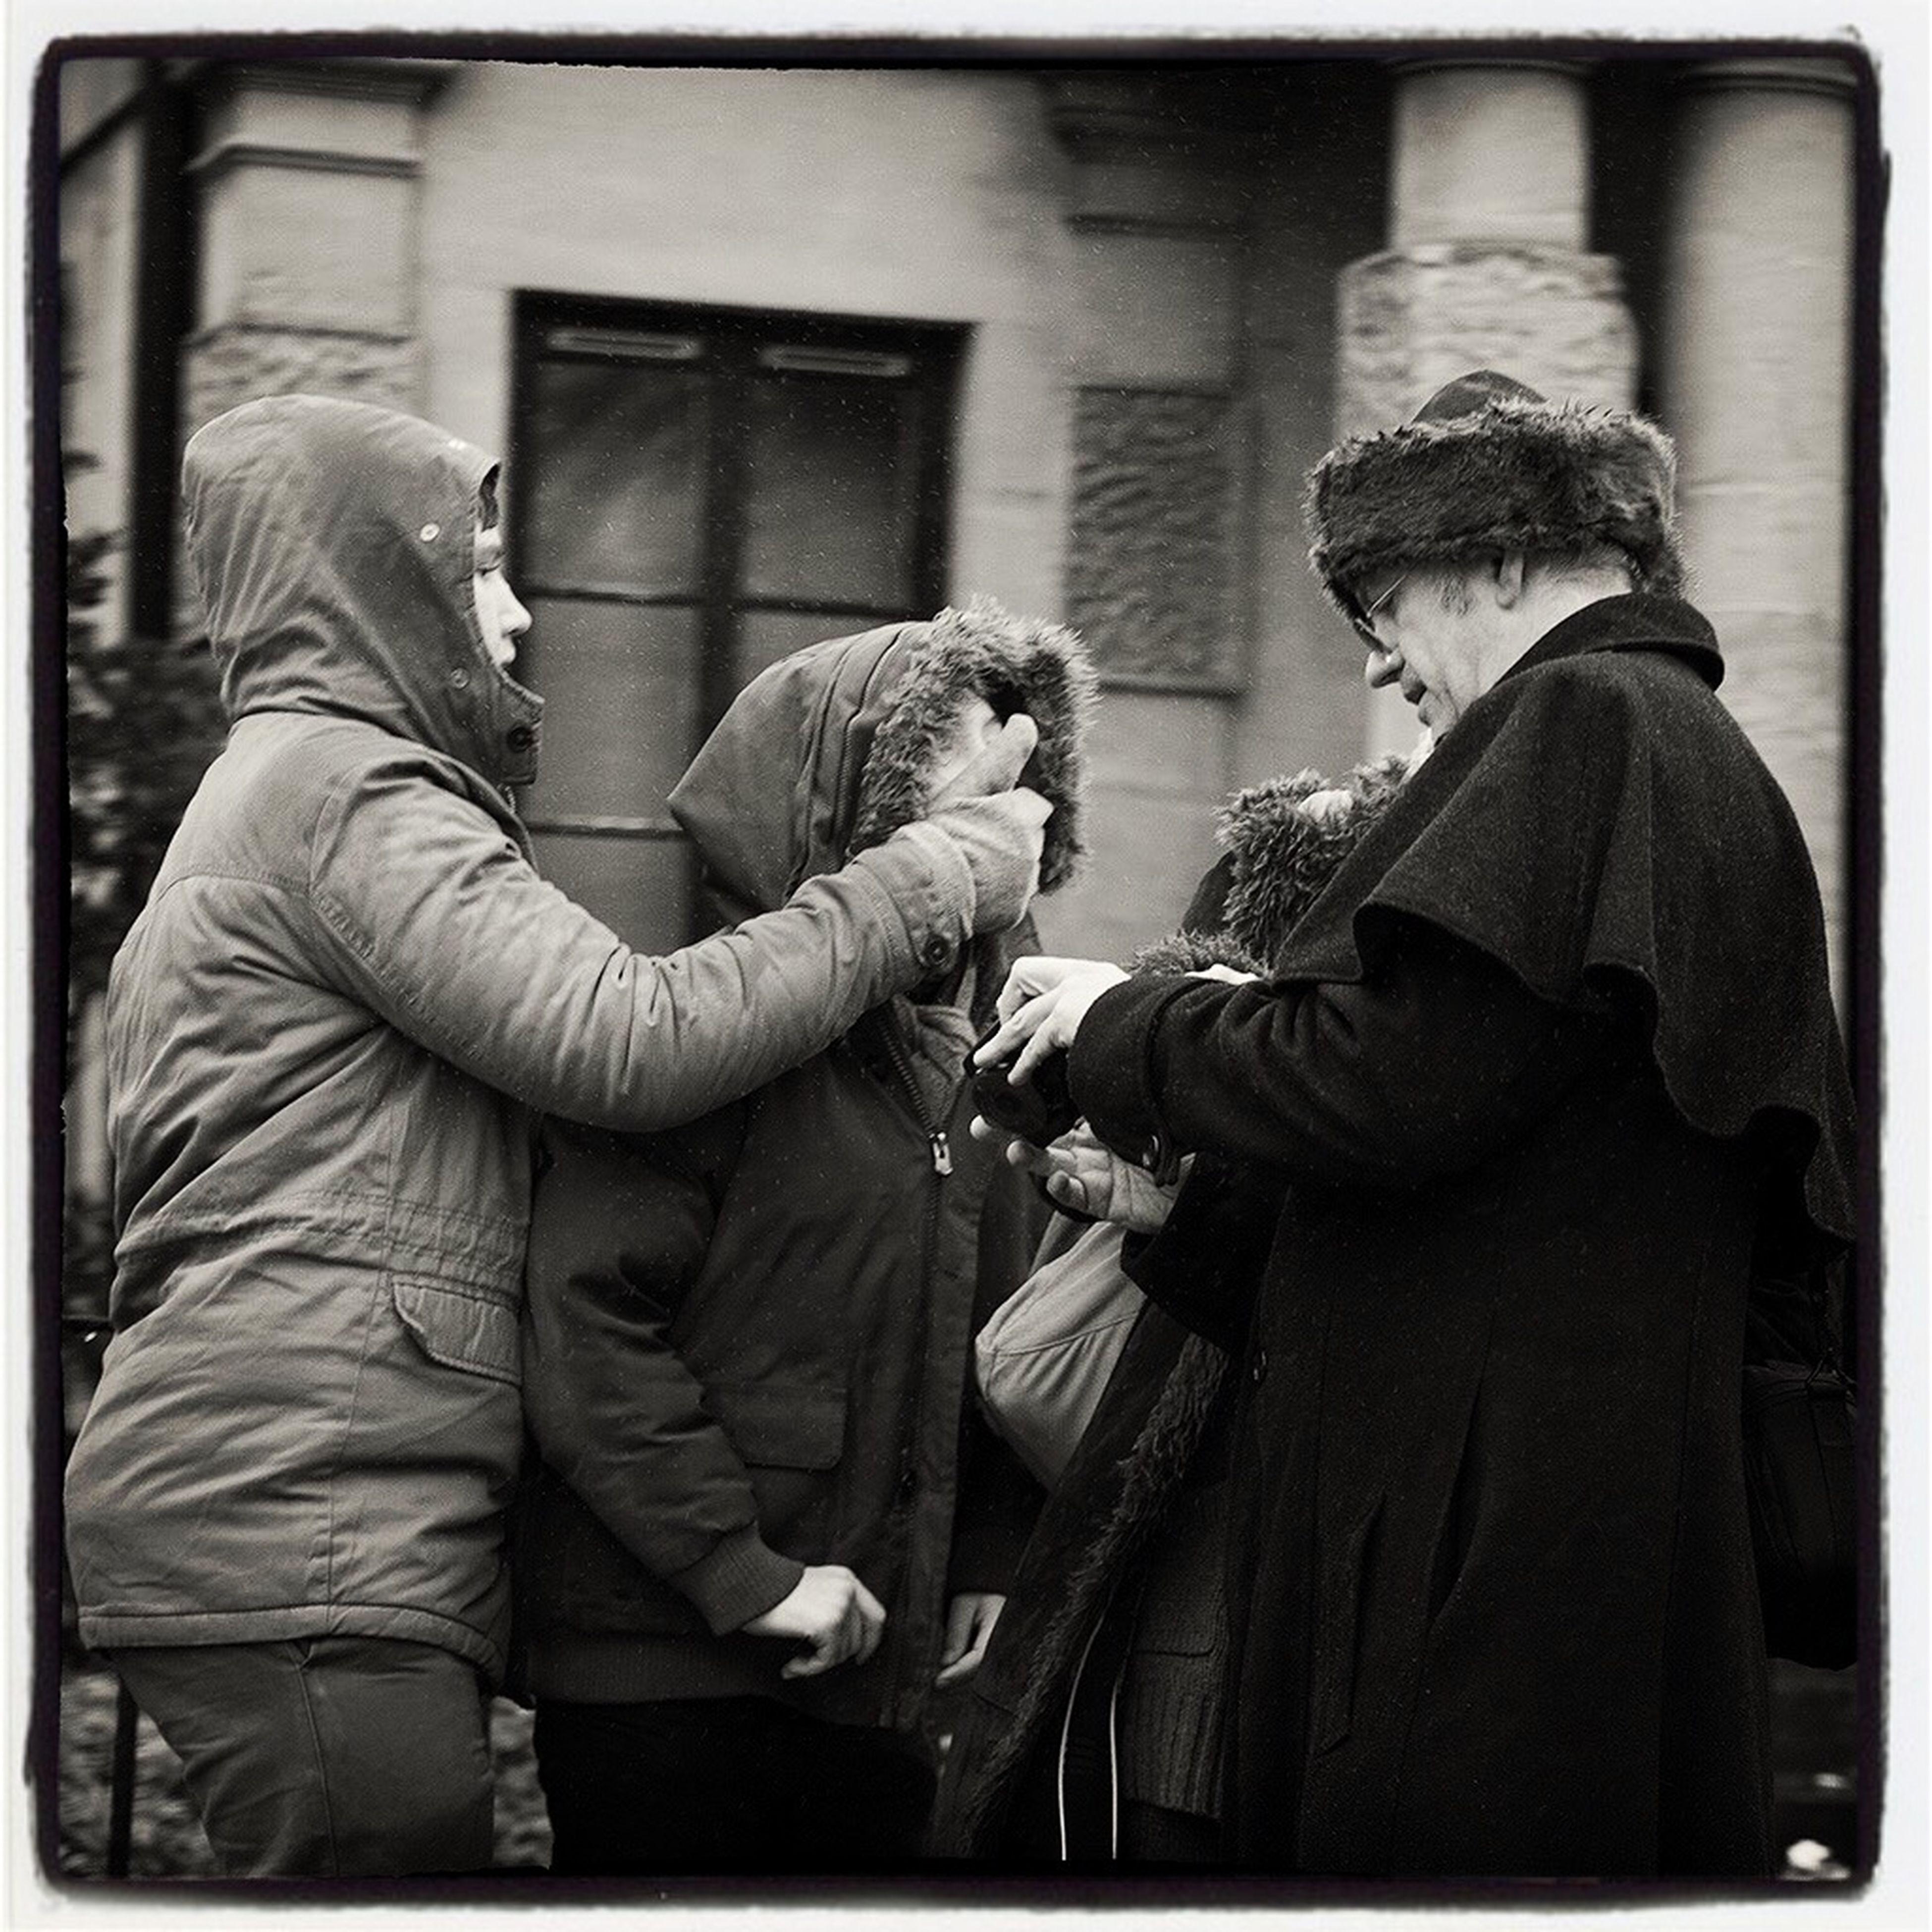 Extraordinary Rendition Finding The Next Vivian Maier EyeEm Nature Lover Streetphotography Taking Photos